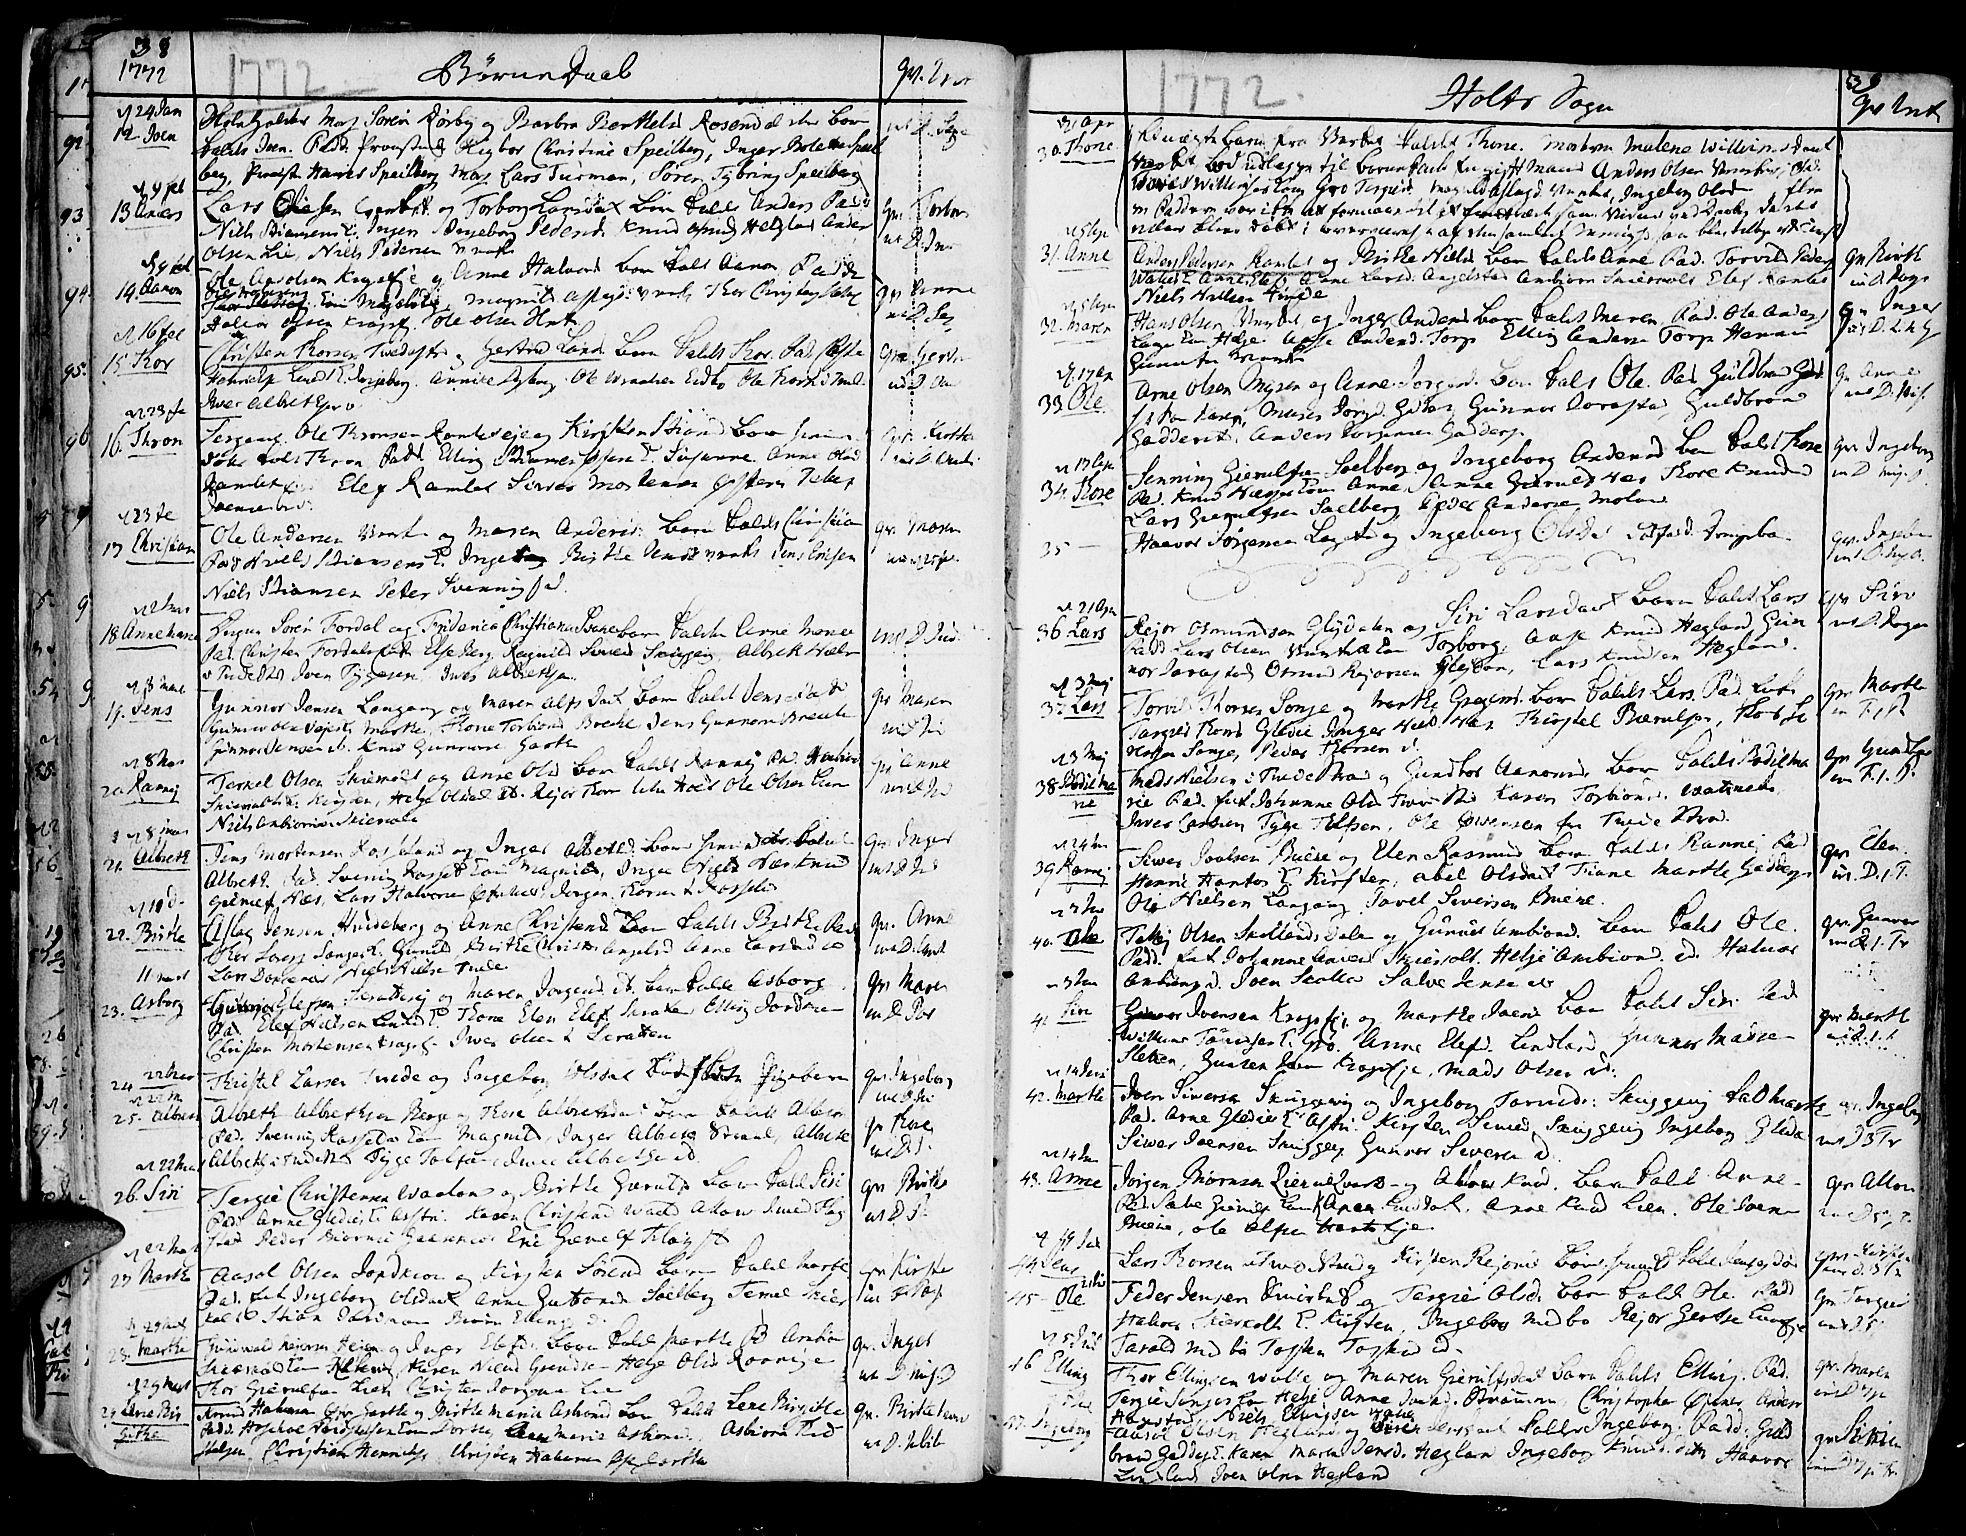 SAK, Holt sokneprestkontor, F/Fa/L0003: Ministerialbok nr. A 3, 1765-1798, s. 38-39